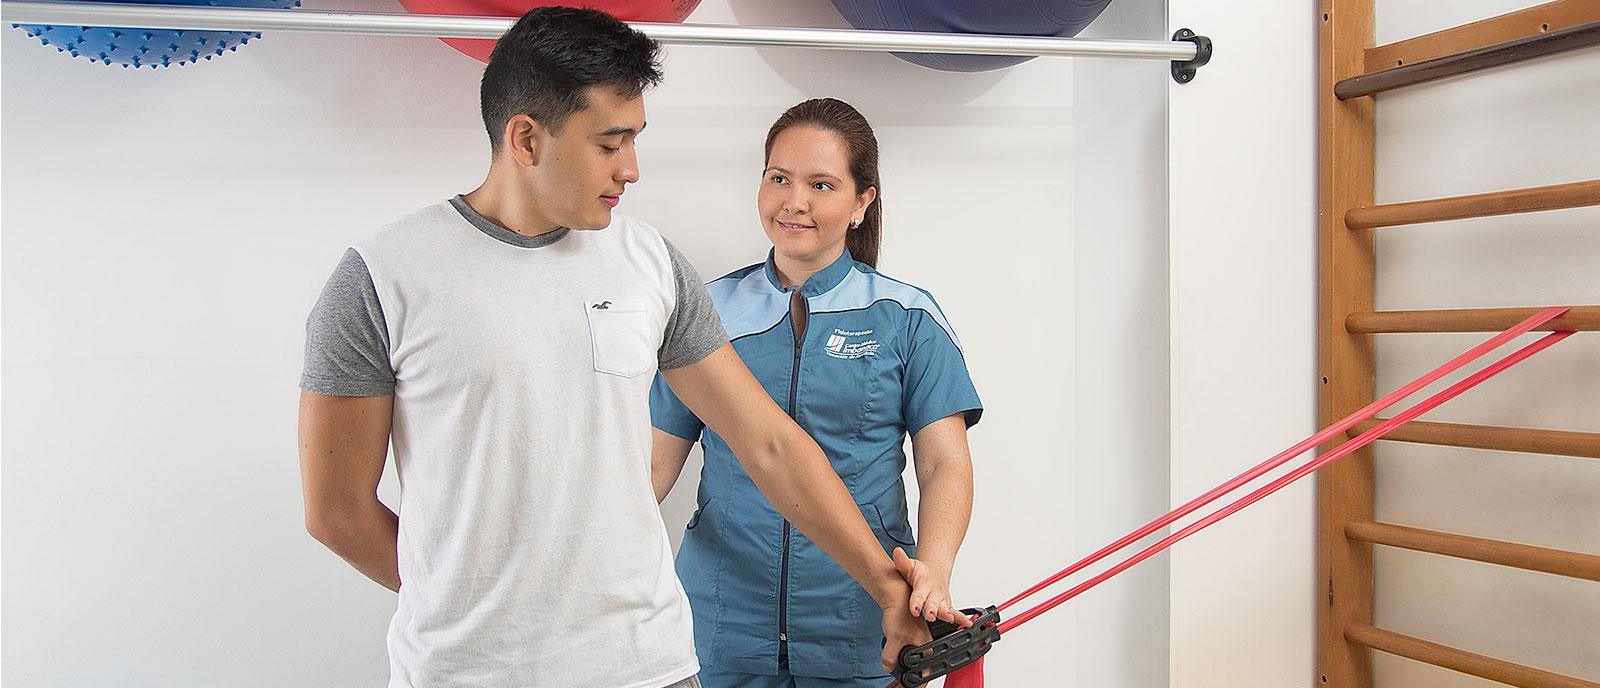 Rehabilitación y Medicina Física - Servicios a Pacientes - Centro ...